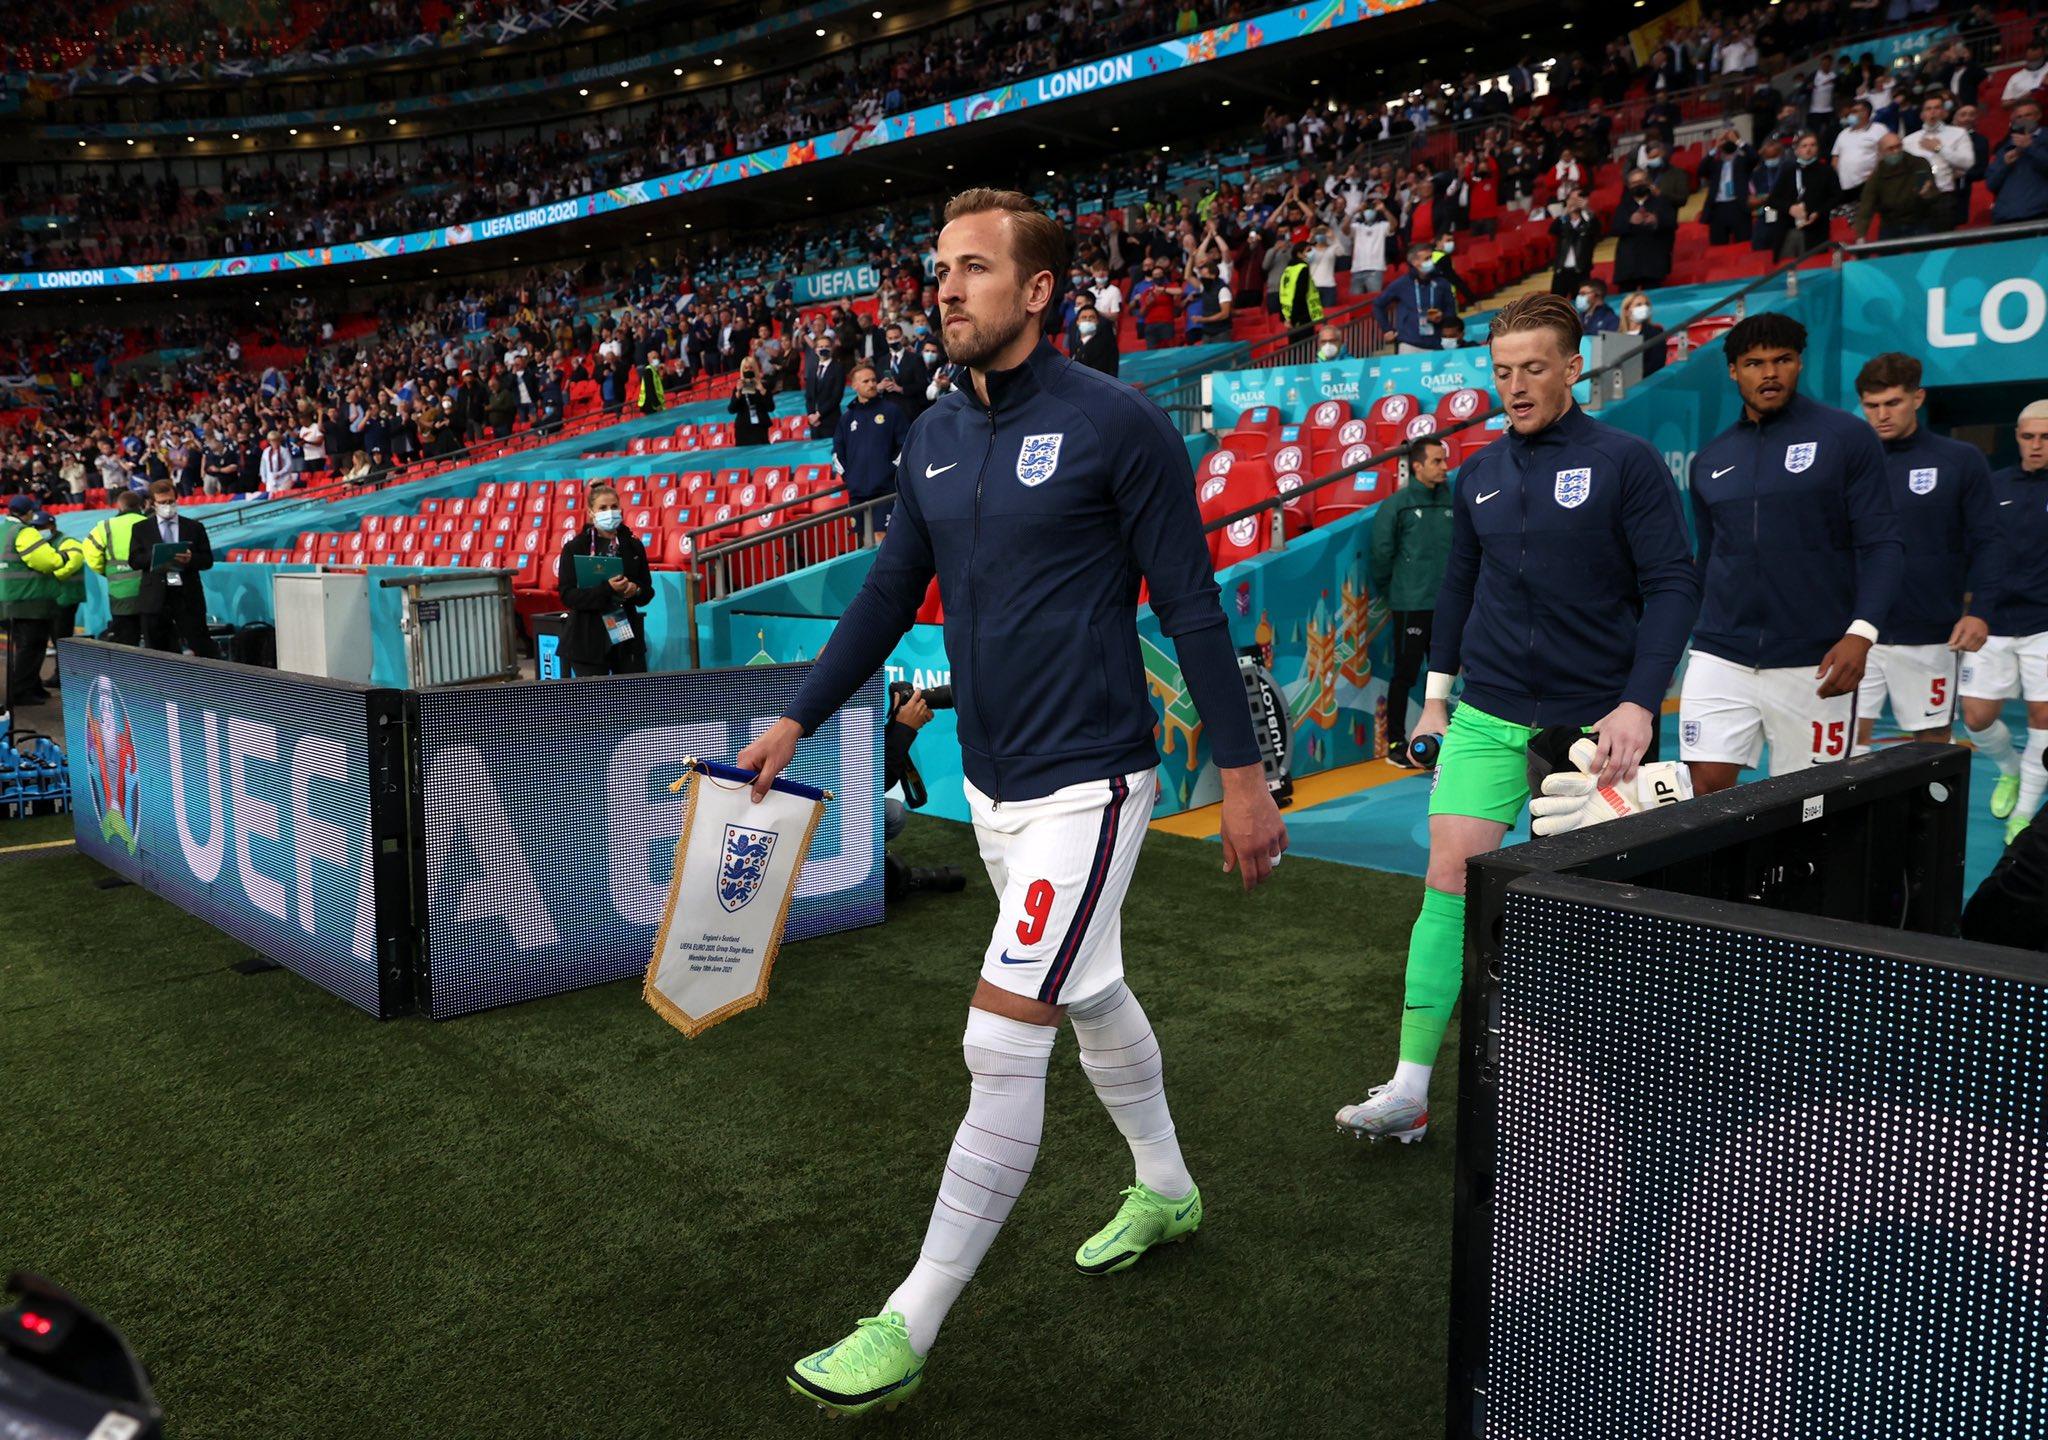 Daftar Klub yang Lolos 16 Besar Piala Eropa Sejauh Ini: Inggris dan Prancis Masuk